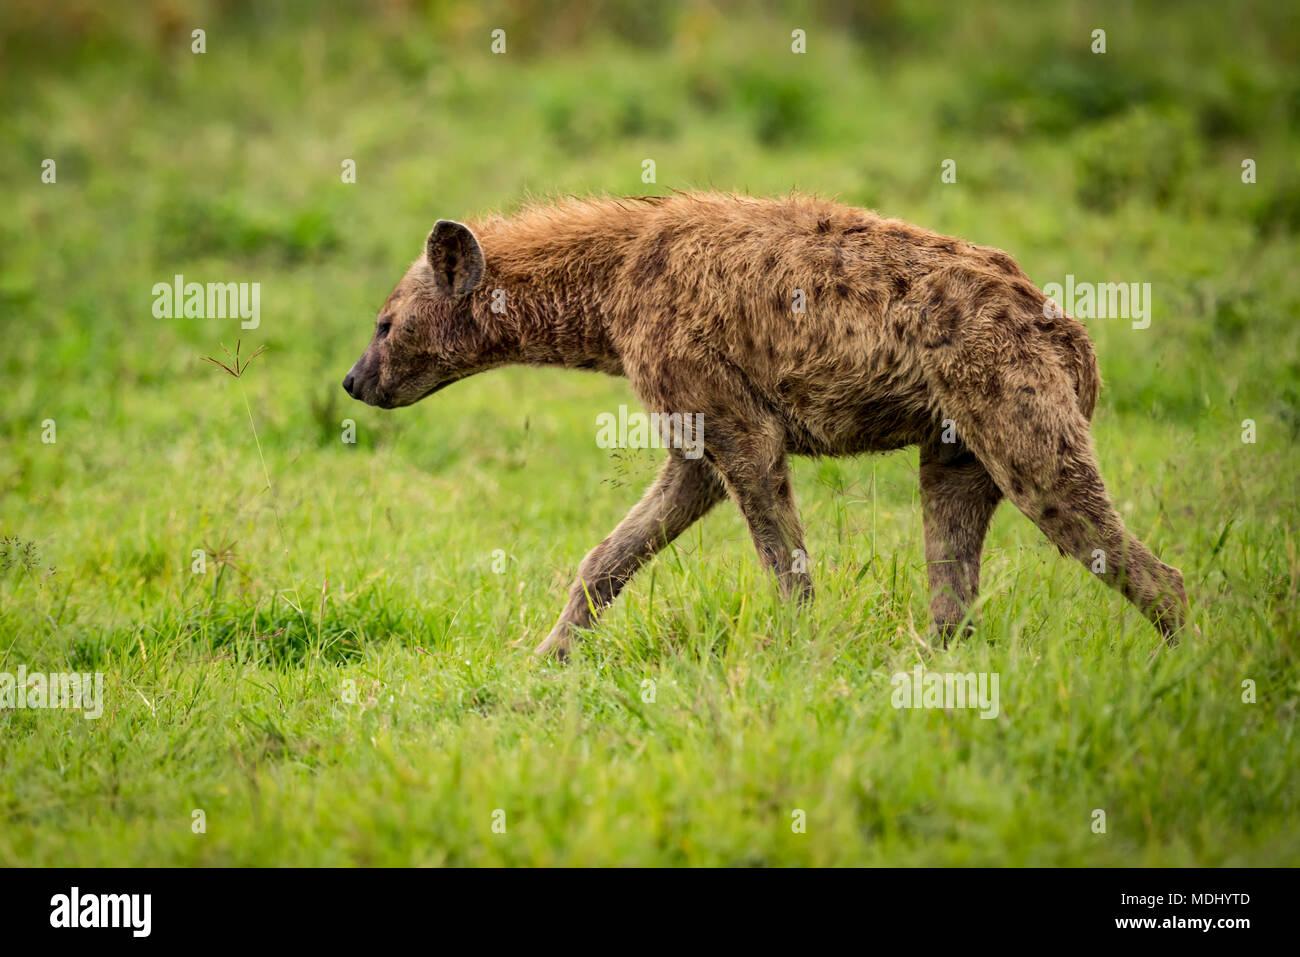 Spotted hyena (Crocuta crocuta) walks through grassland in profile, Ngorongoro Crater; Tanzania - Stock Image